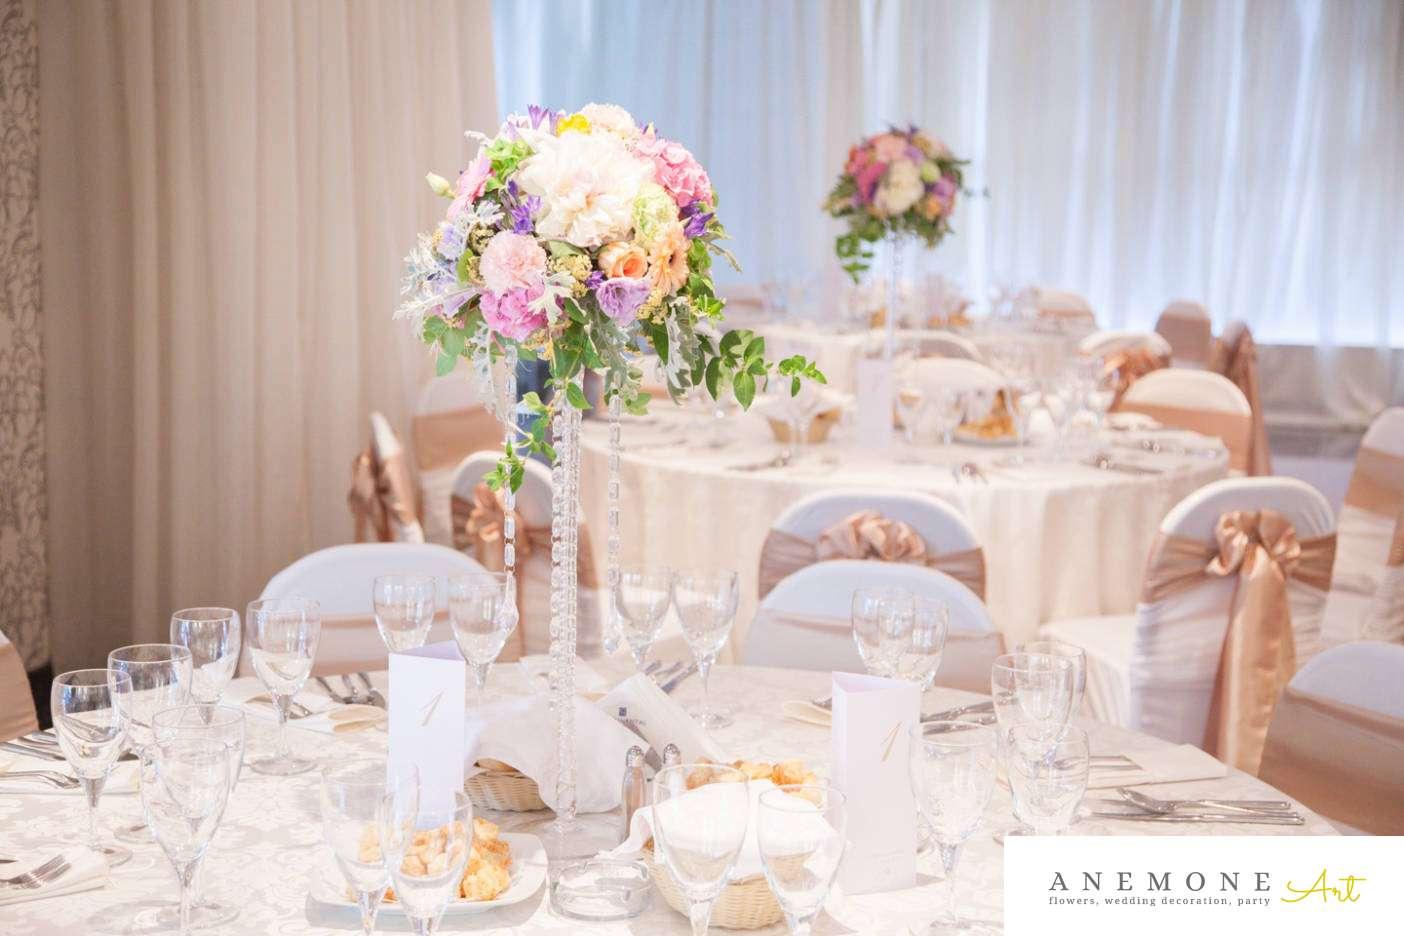 Poza, foto cu Flori de nunta decor masa, hotel continental in Arad, Timisoara, Oradea (wedding flowers, bouquets) nunta Arad